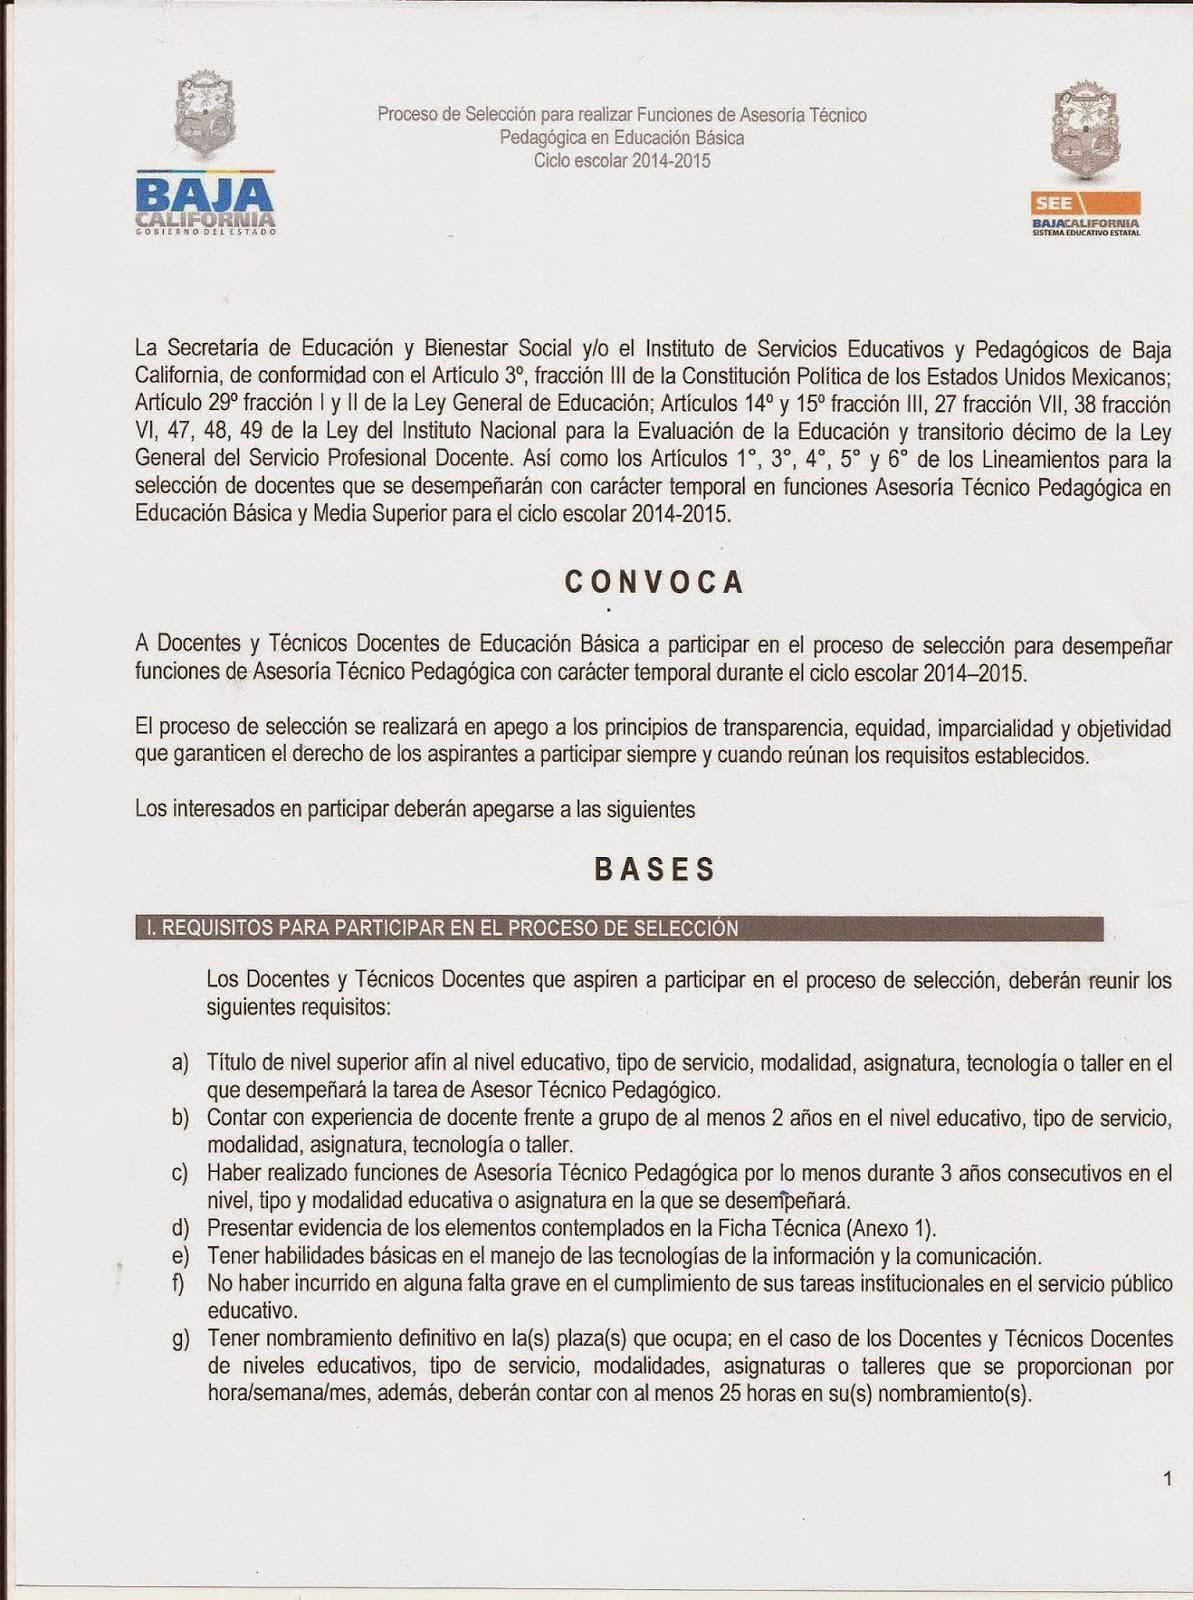 Supervisi n zona 24 convocatoria para el proceso de for Convocatoria para docentes